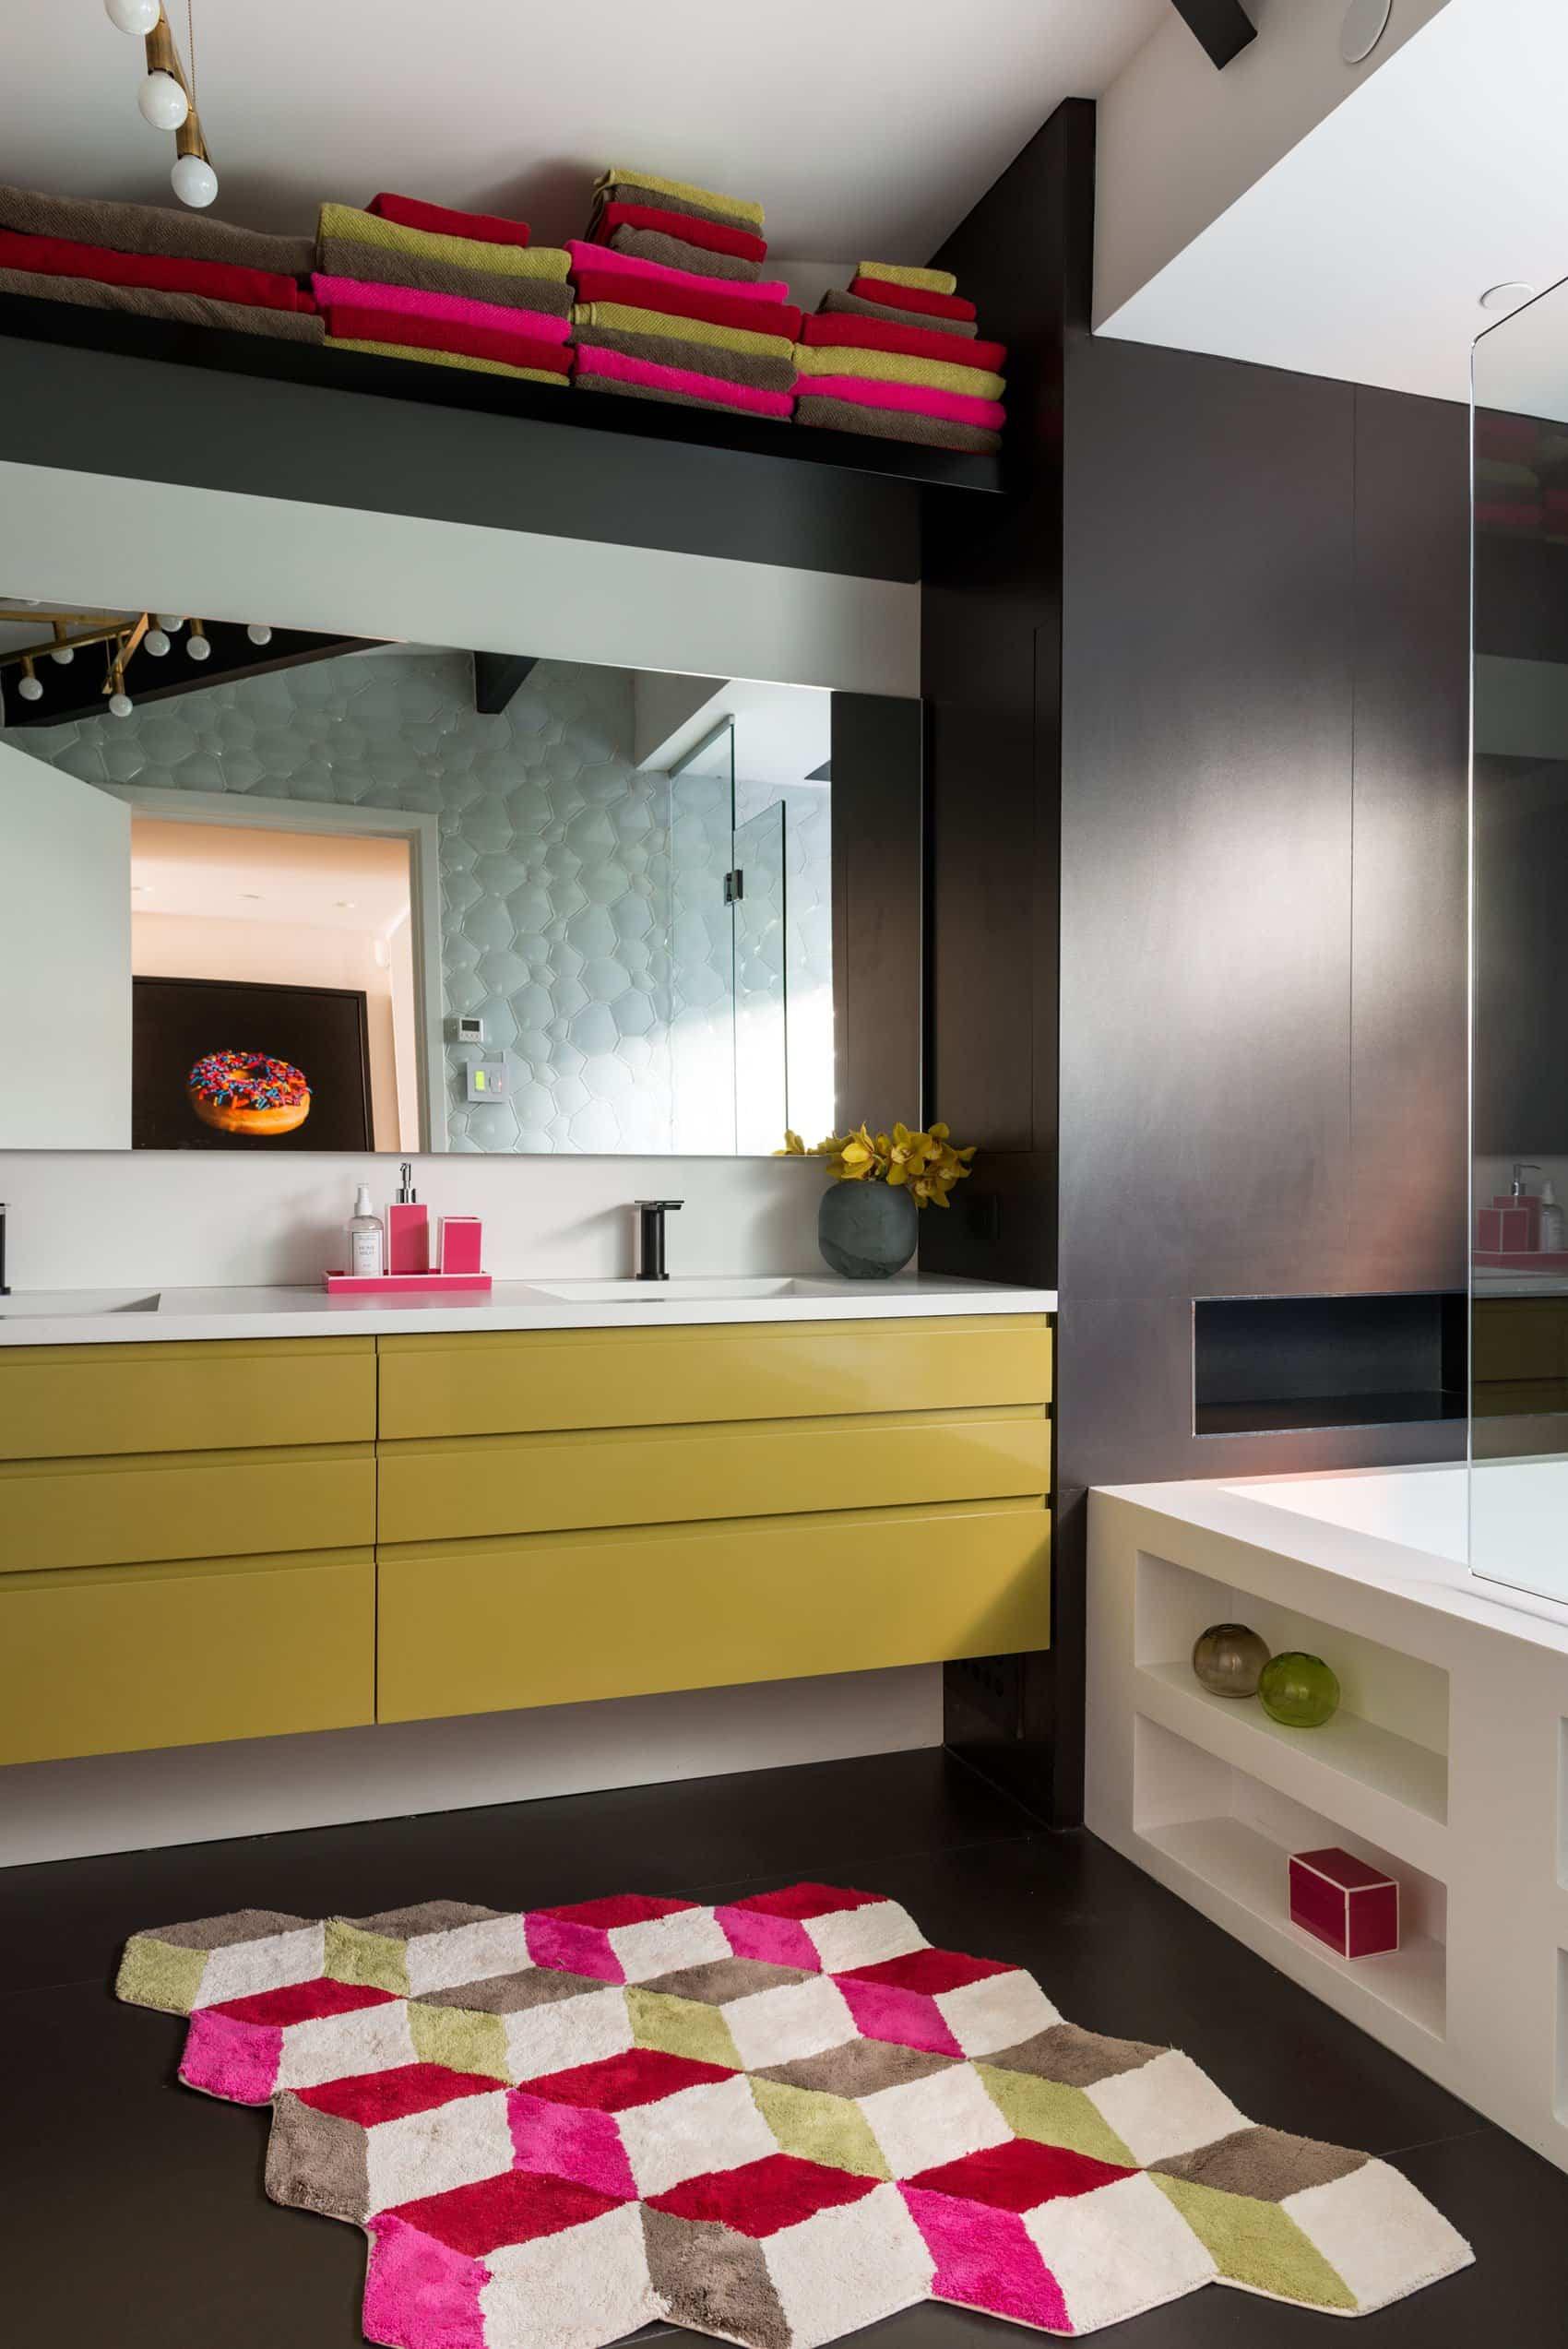 Residencia familiar - baños diseño moderno